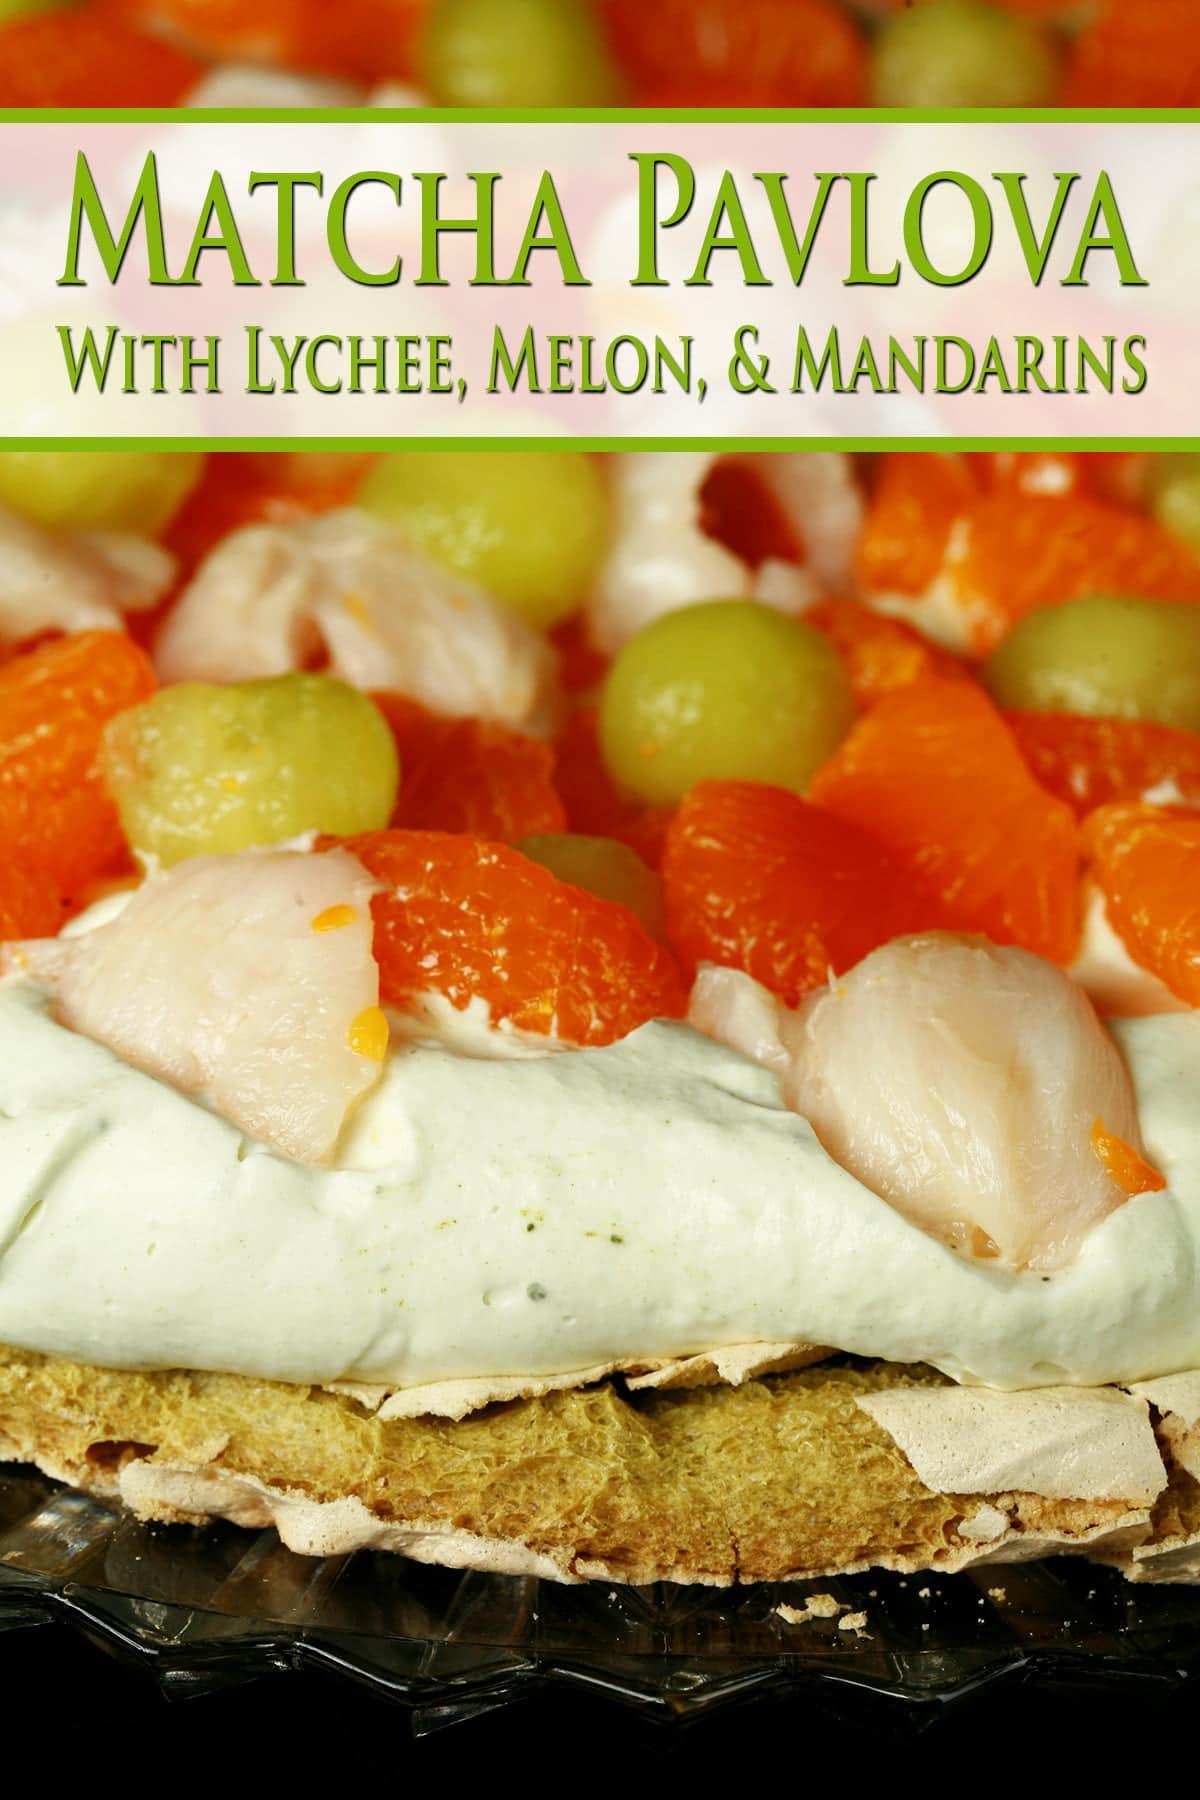 A Matcha Pavlova with Mandarin orange segments, lychee, and honeydew melon on top.